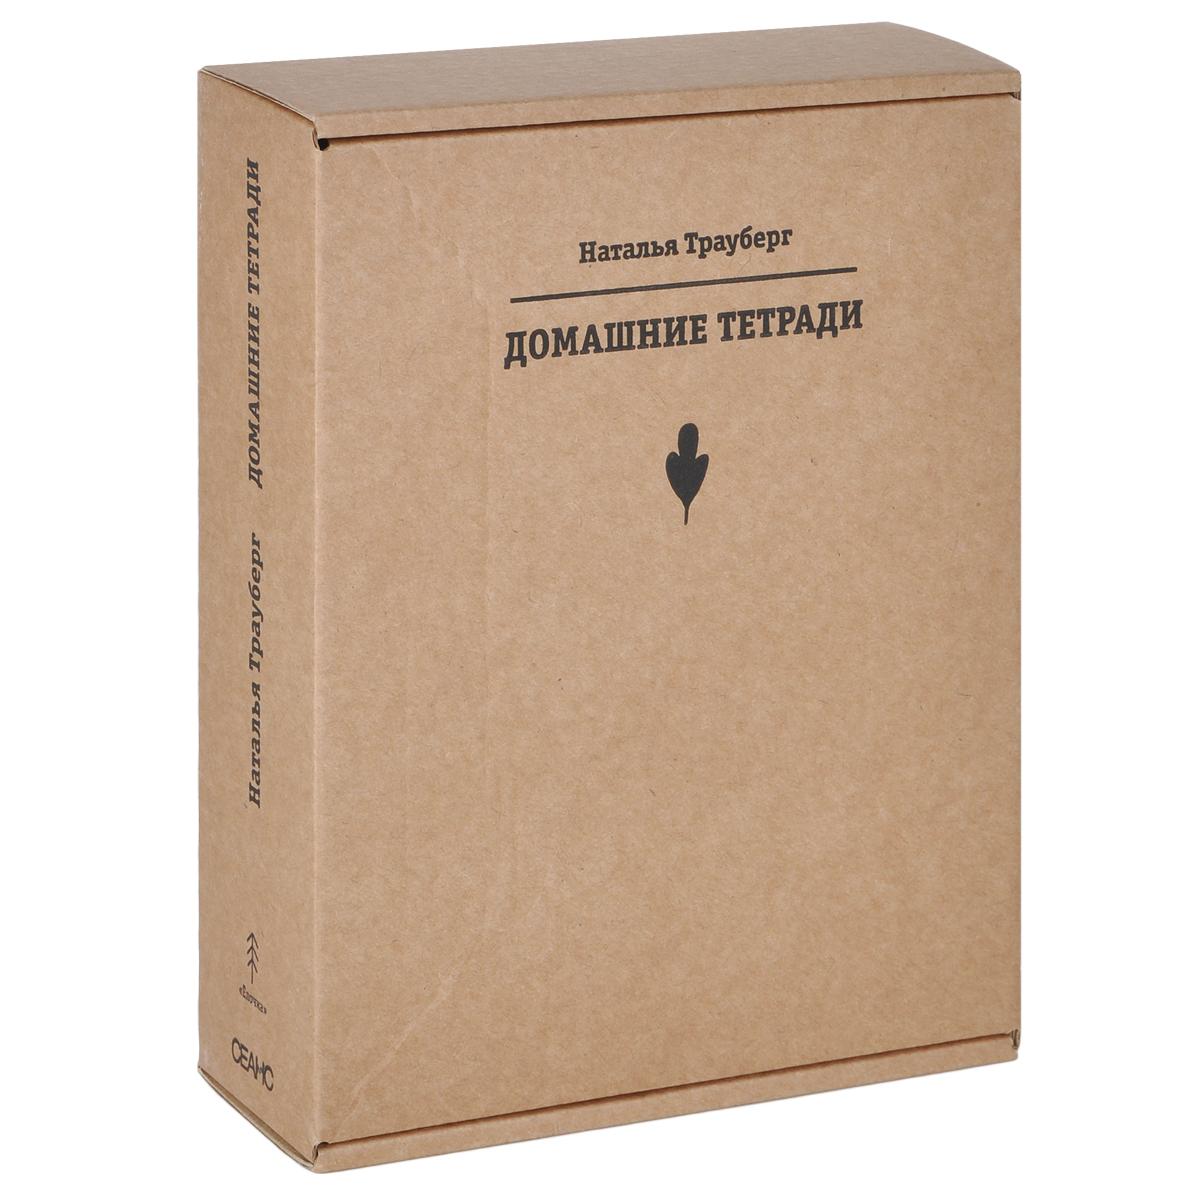 Домашние тетради (комплект из 7 тетрадей)